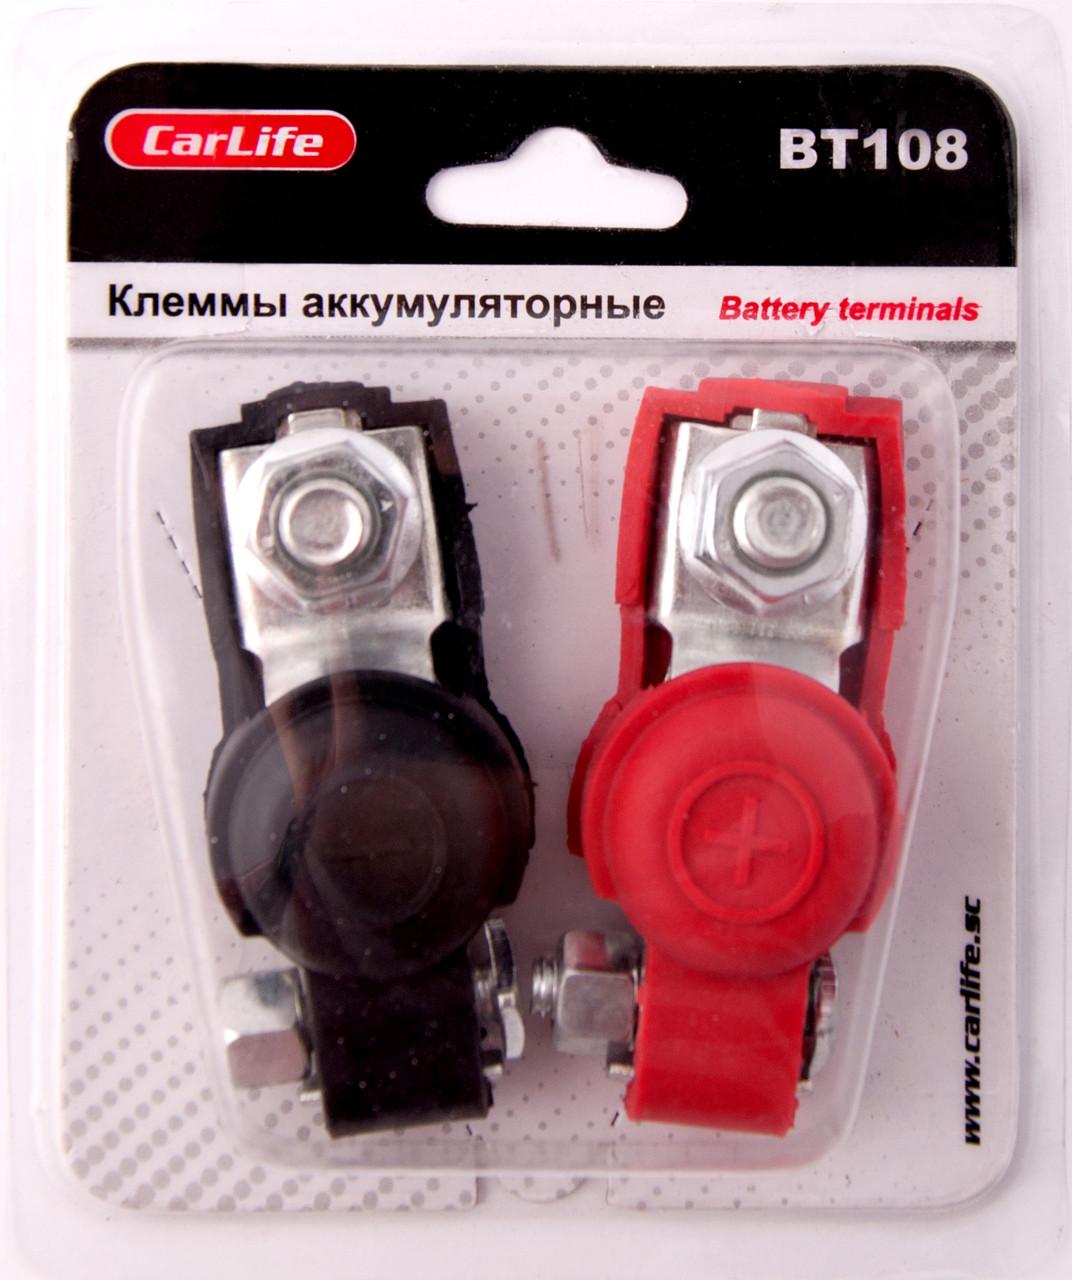 Клеммы на аккумулятор автомобиля CarLife BT 108